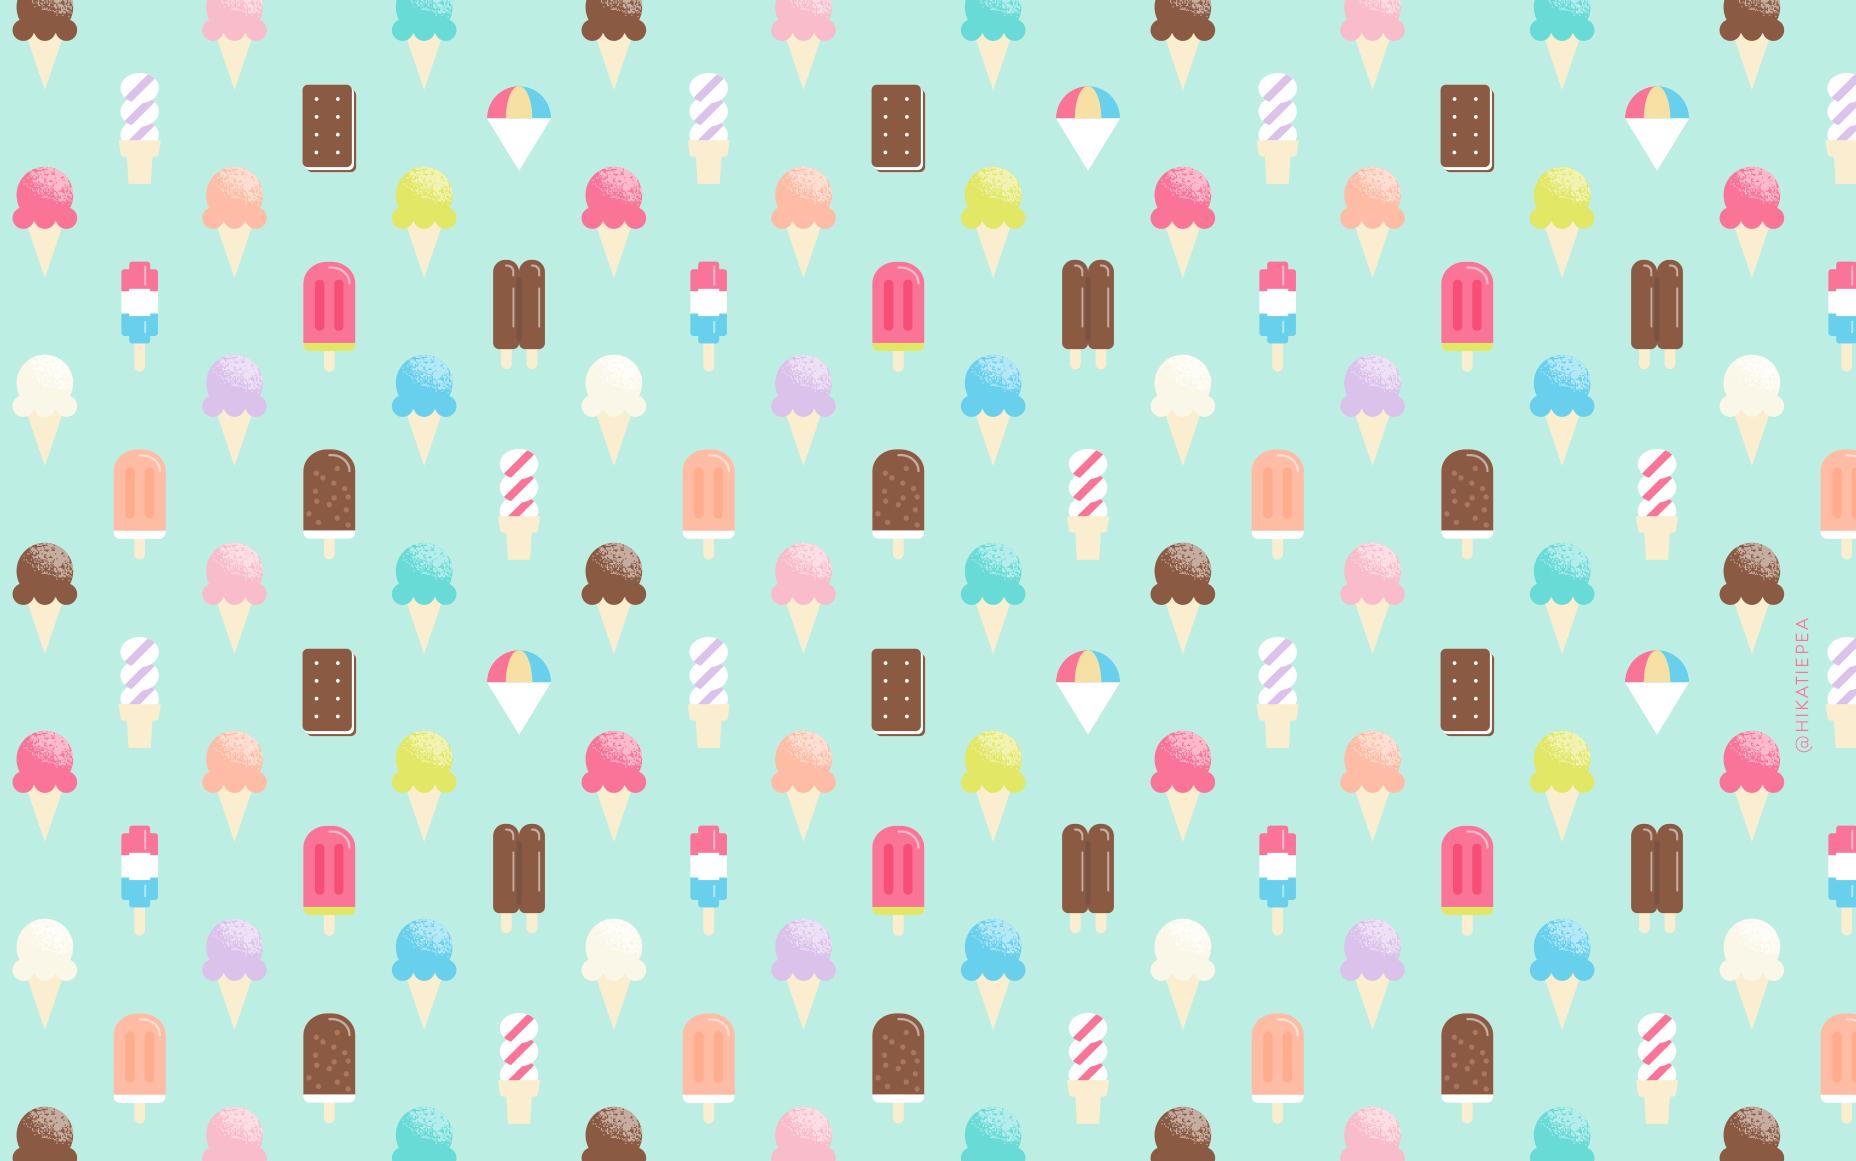 ice cream clothing wallpaper - photo #9